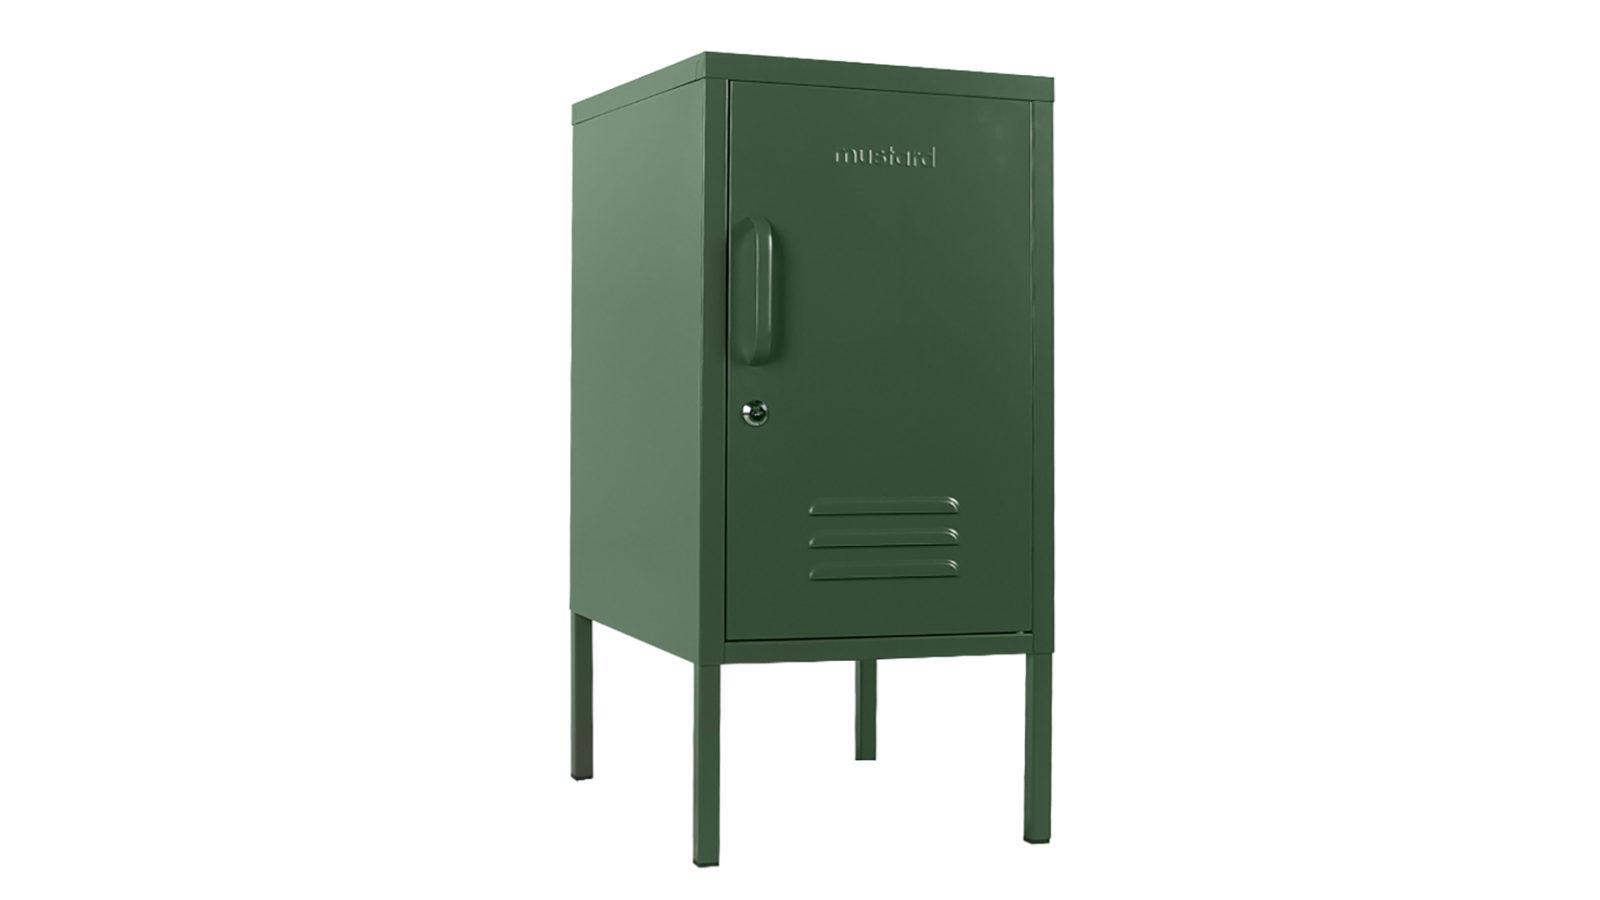 Locker-The-Shorty-in-Olive